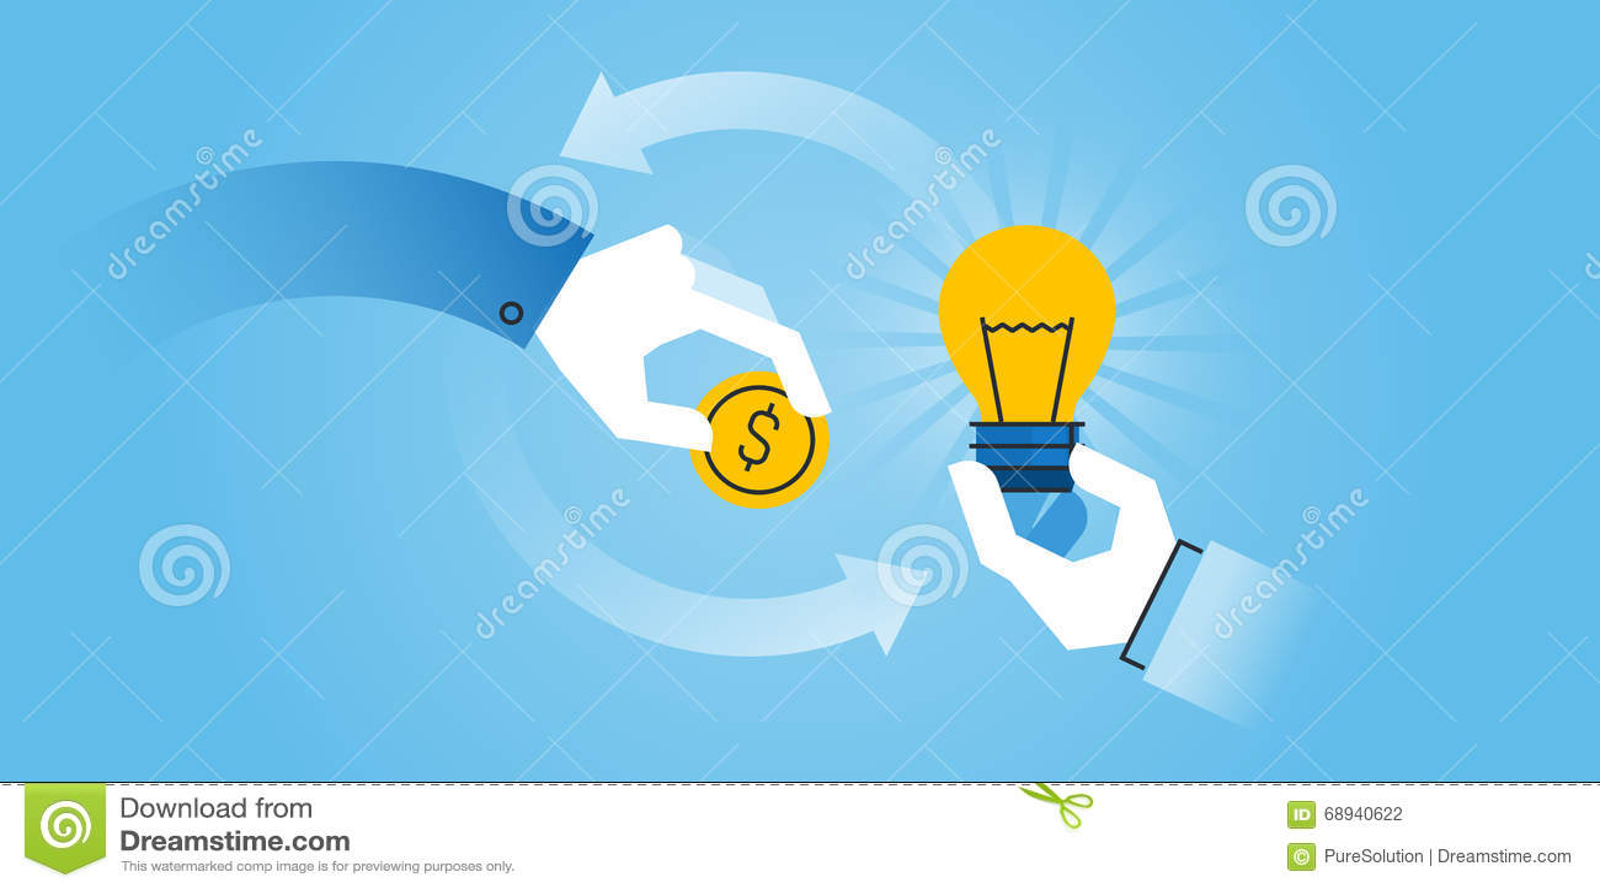 Line Design Solutions : Flat line design website banner of crowdfunding stock